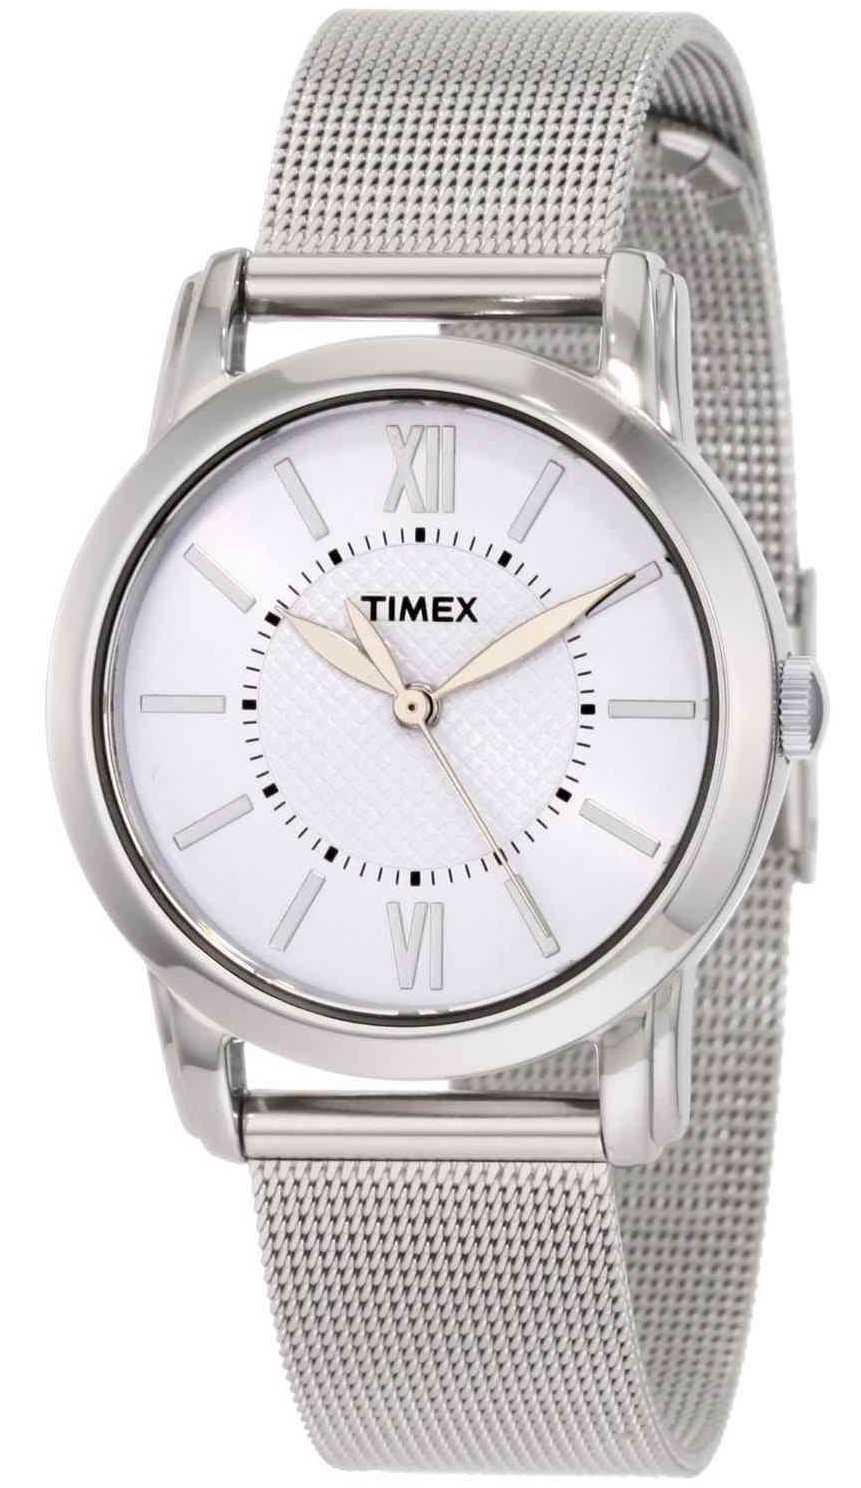 Timex Womens Silver Dial Mesh Bracelet  Watch T2N679